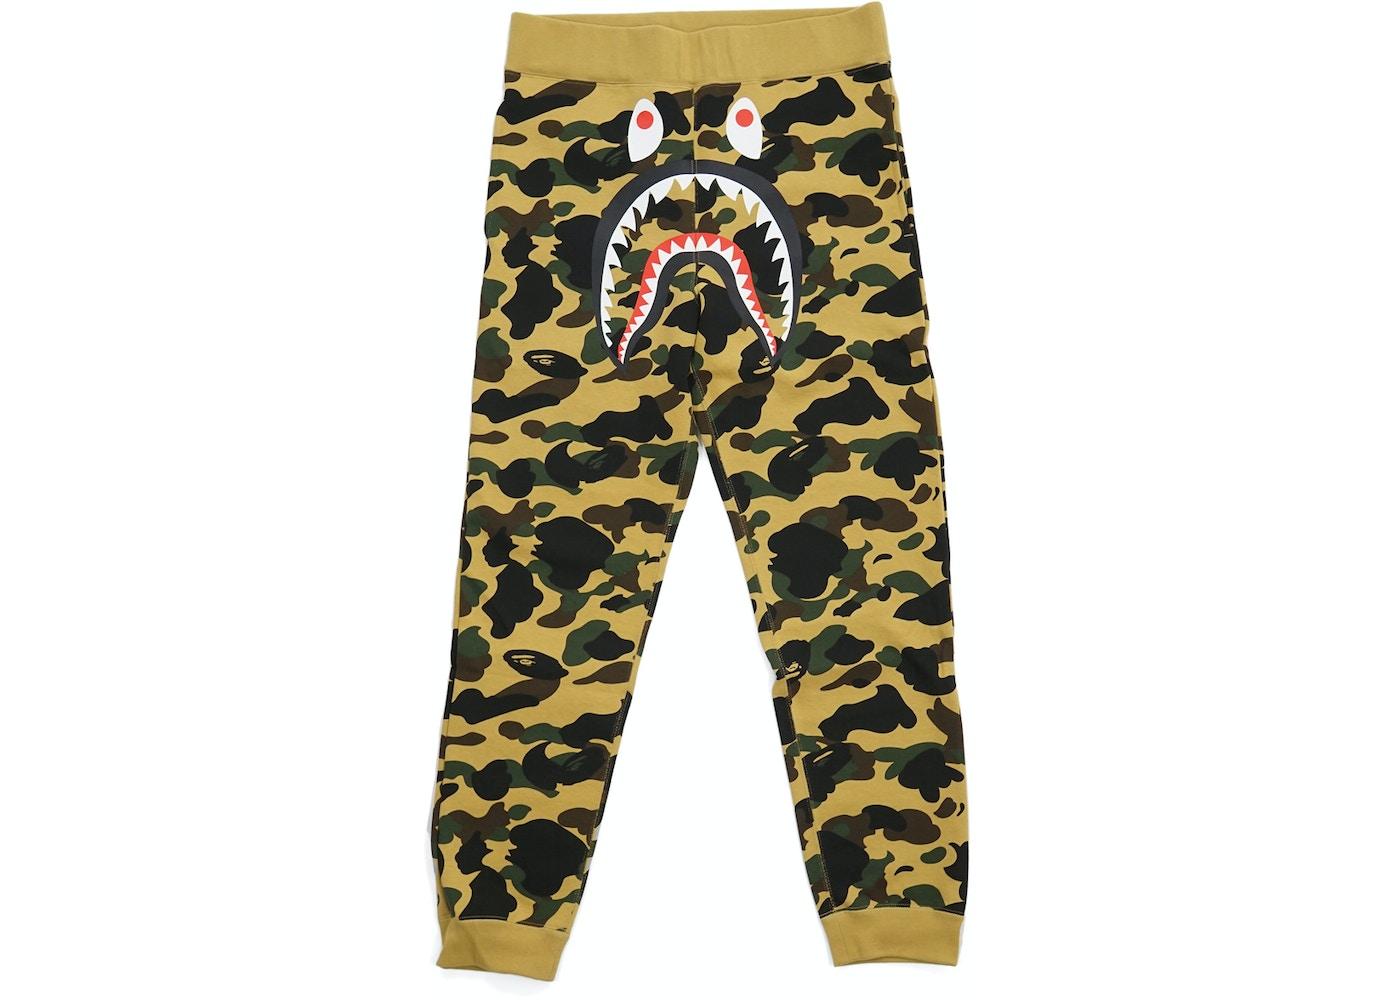 BAPE 1st Camo Shark Slim Sweatpants Yellow - b19a7827dcff